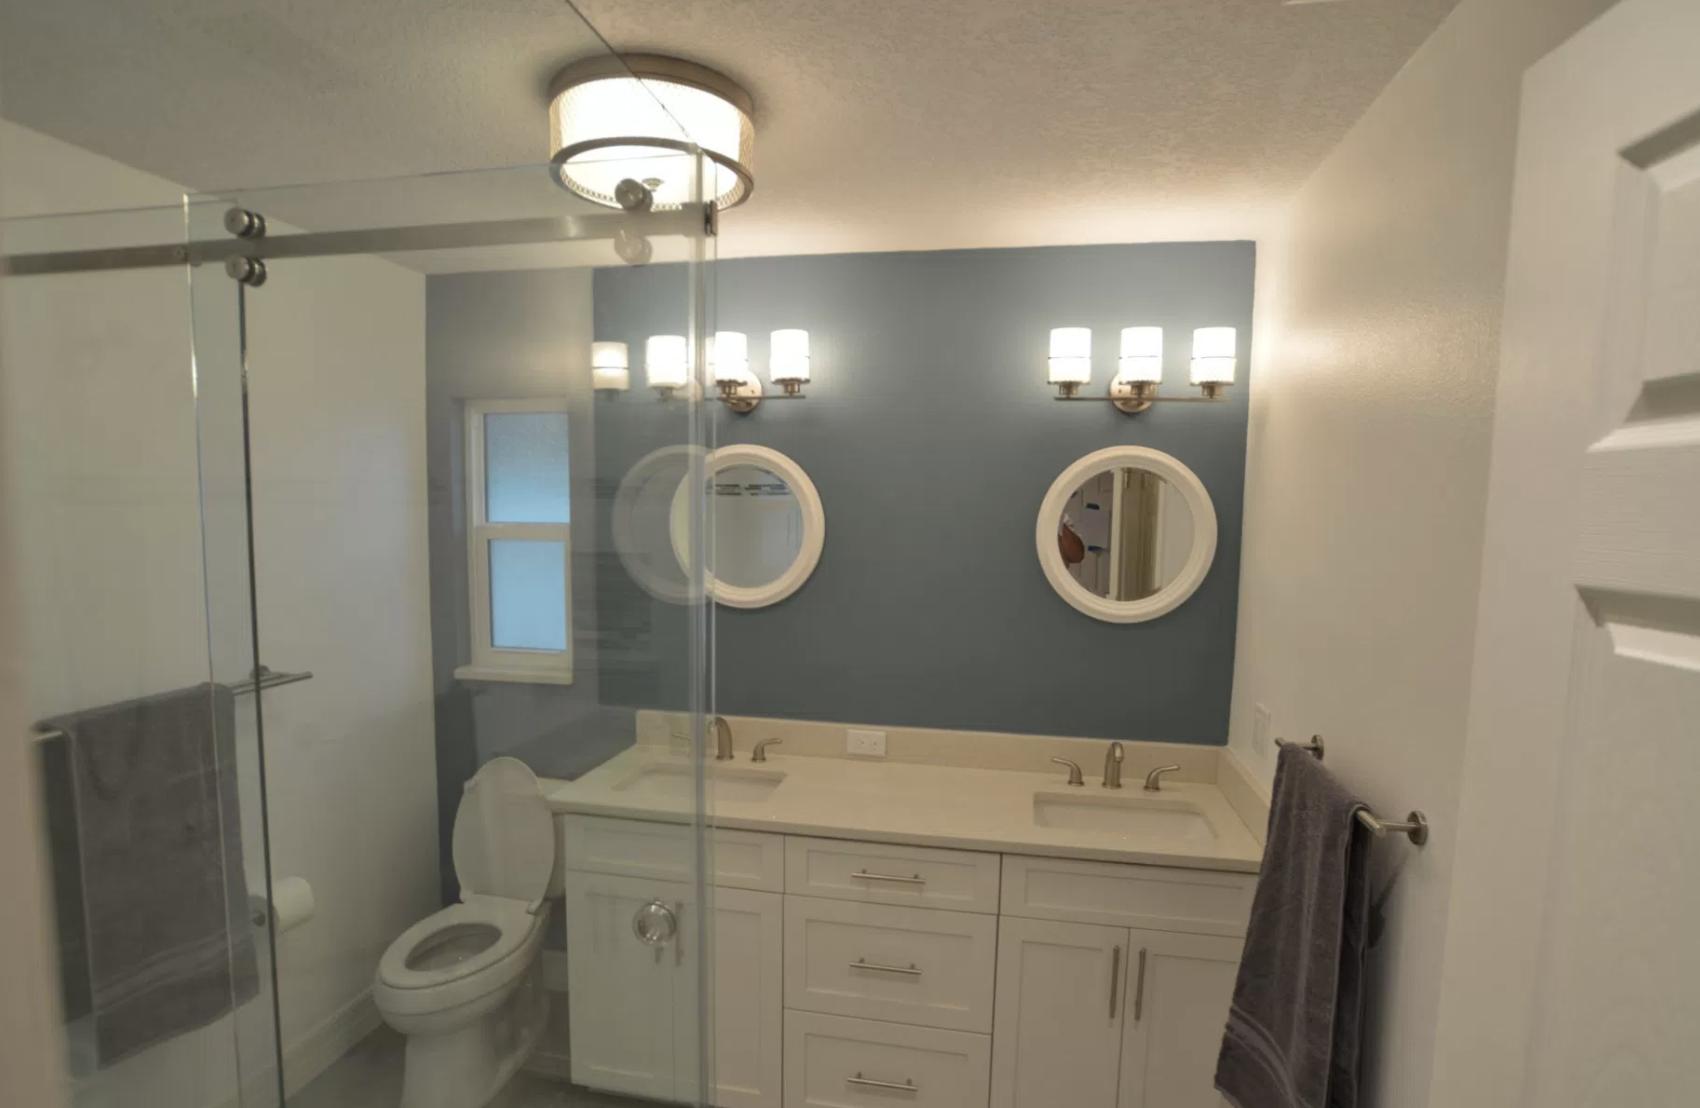 Love This Simple But Elegant Bathroom Remodel By Jamco Unlimited In - Tremain bathroom remodeling